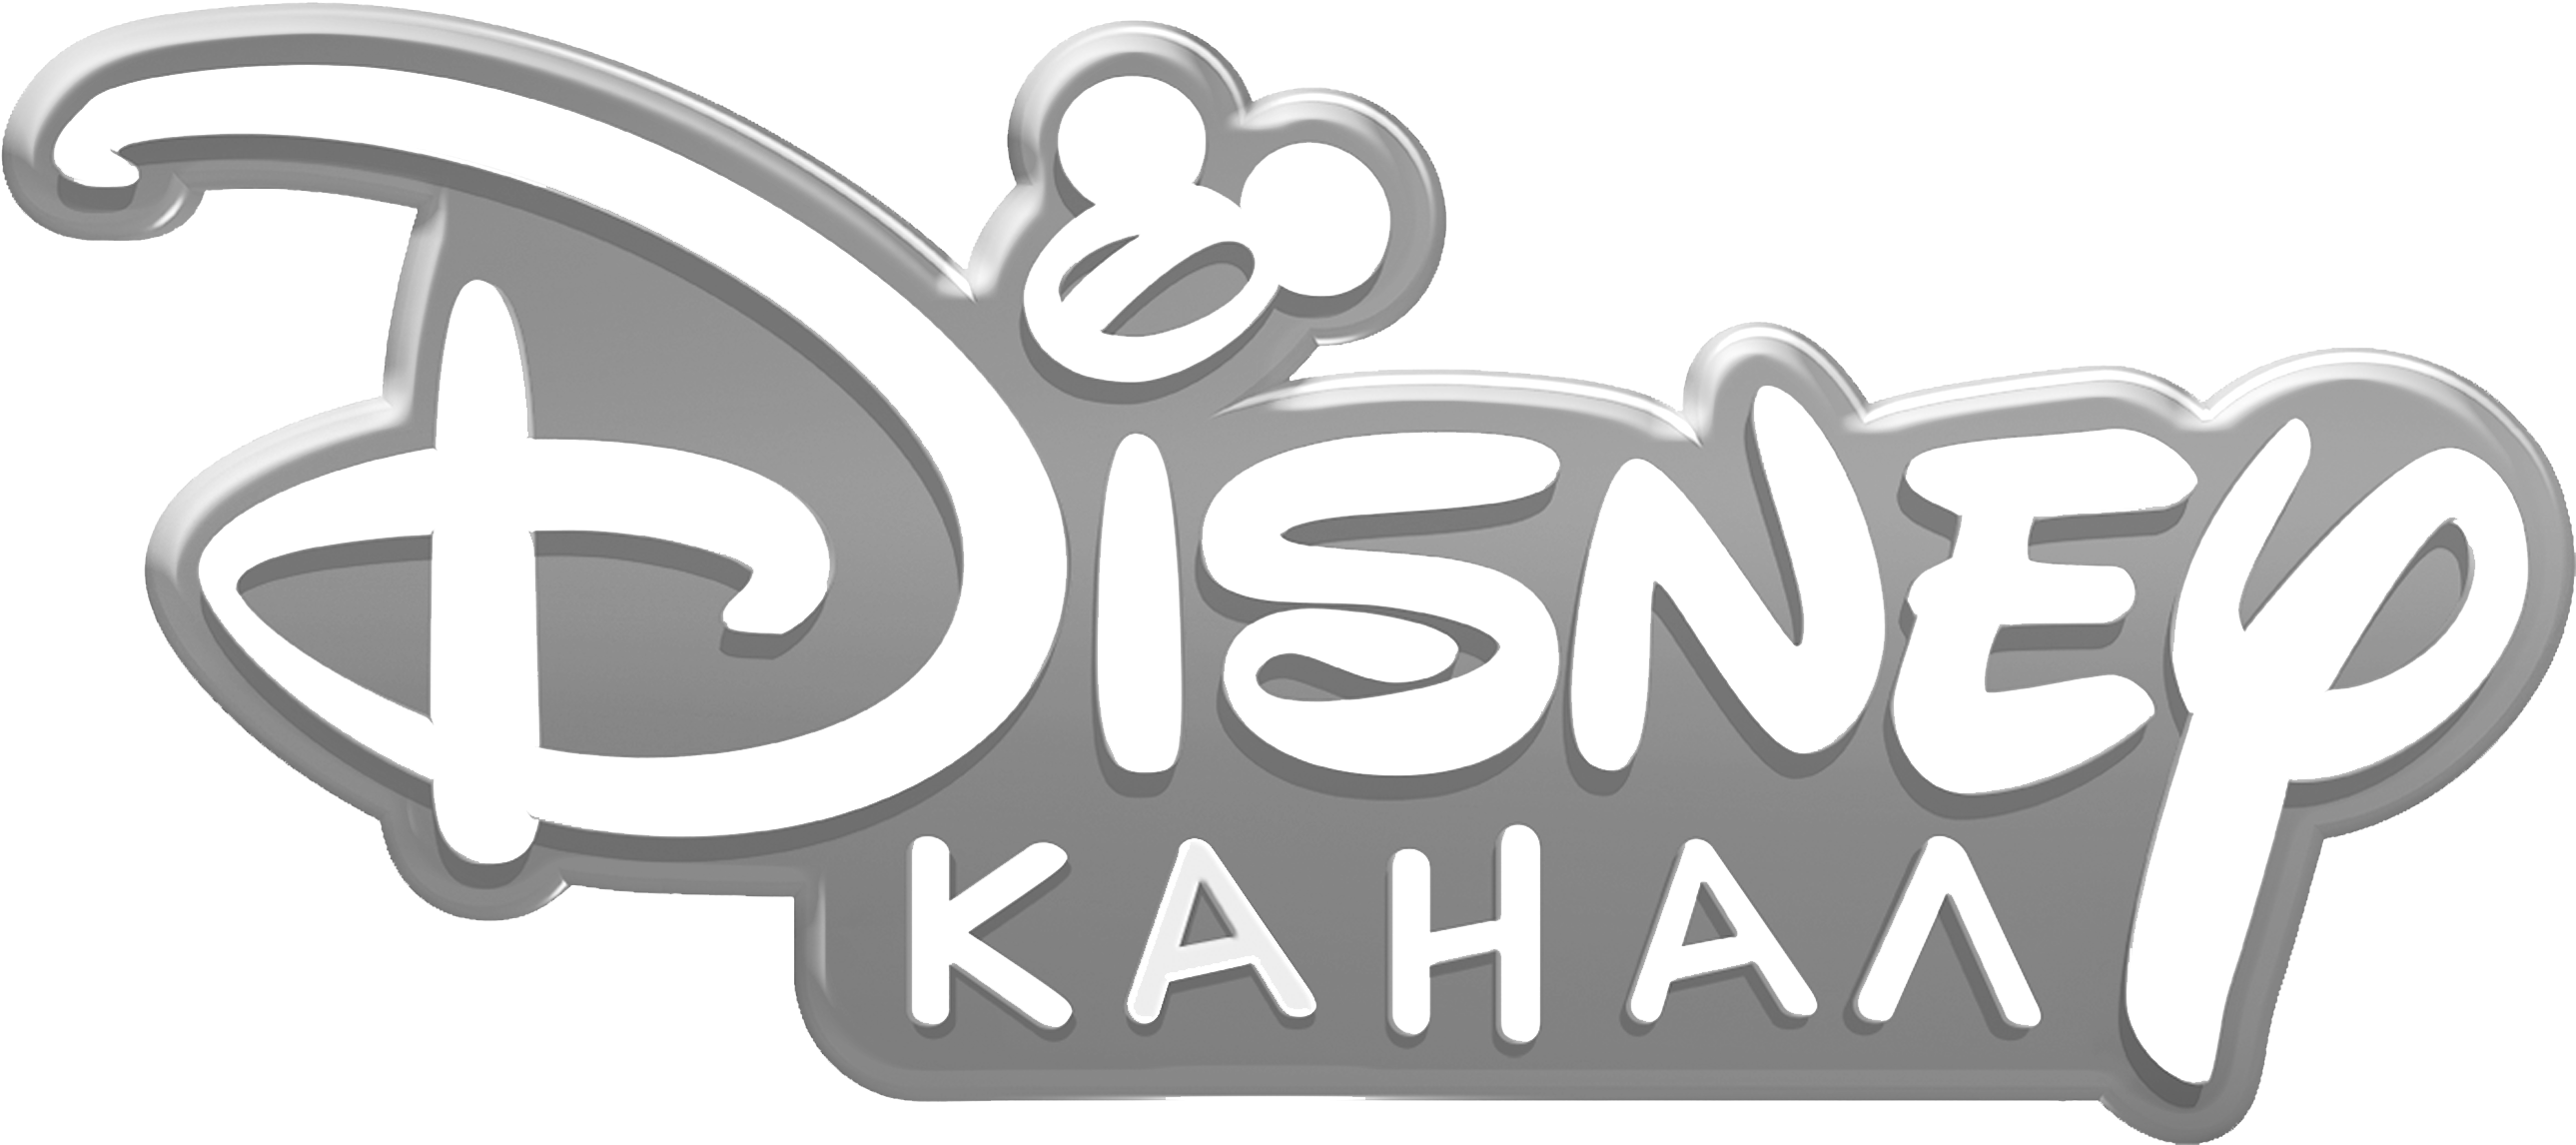 Канал Disney (четвёртый логотип во время передач, 1 сентября 2017 - 31 августа 2018)